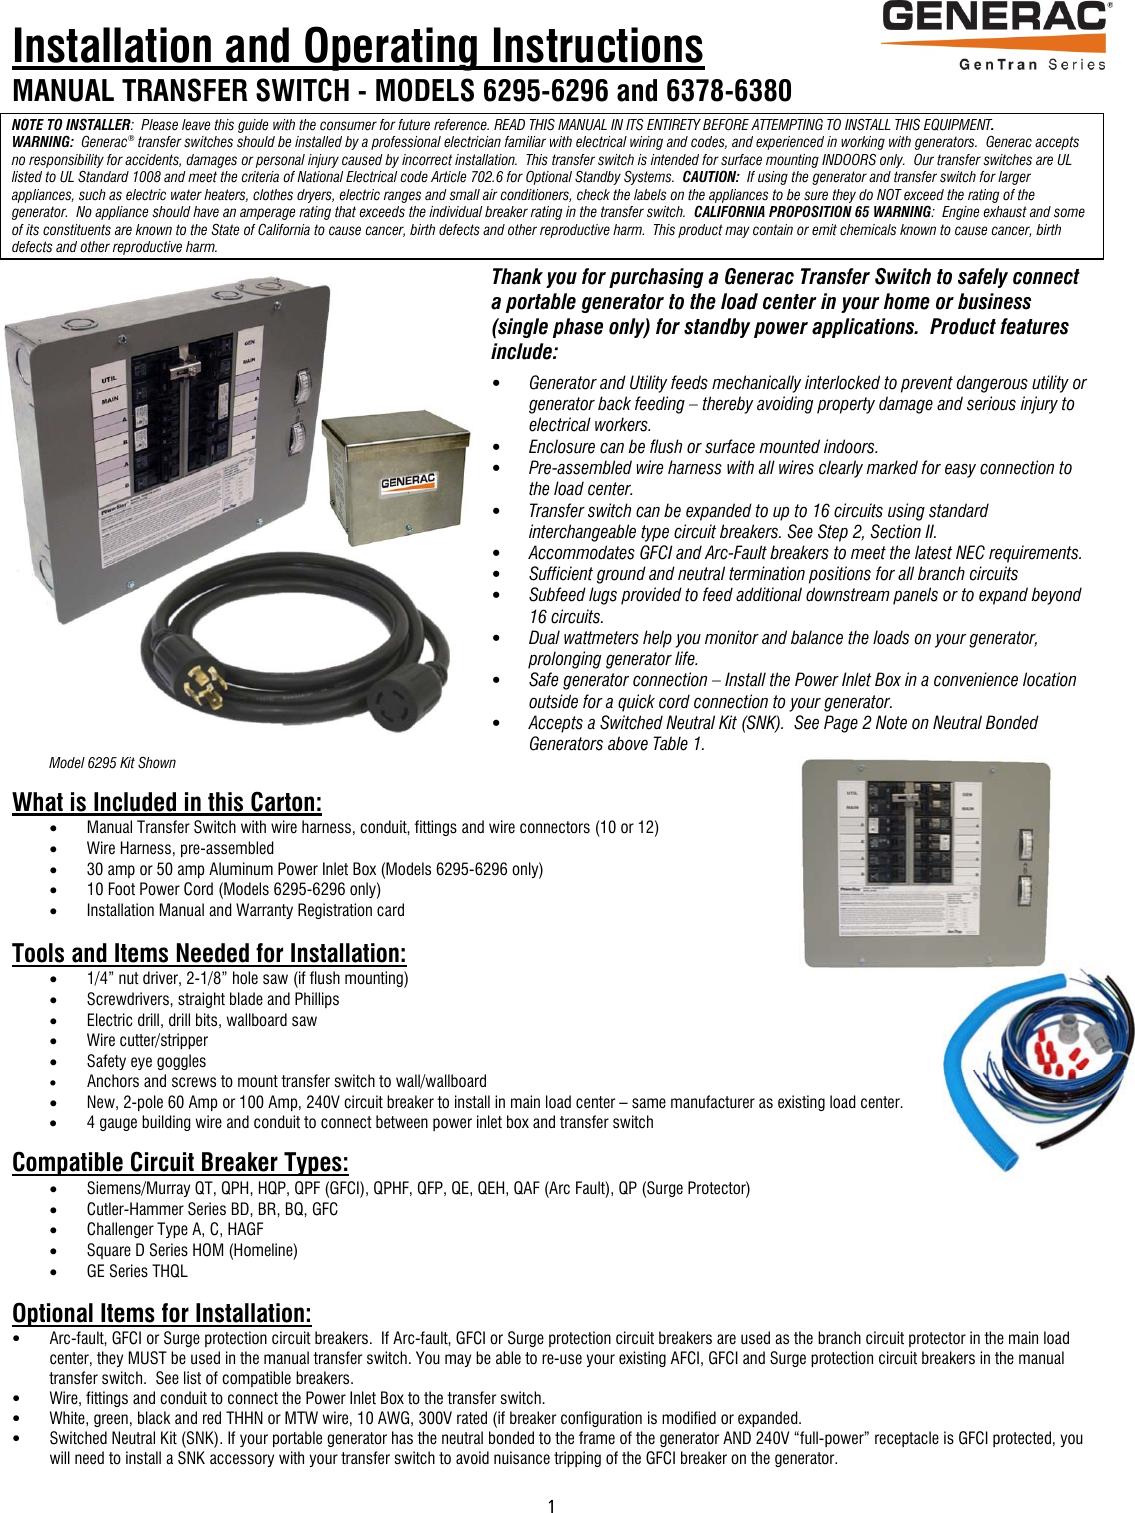 Generac6295 6296 6378 6380 Installmanualreva Eng 65807 2 Generac Murray 20amp 65 In Whole House Surge Protected Circuit Breaker 6379 Instructions